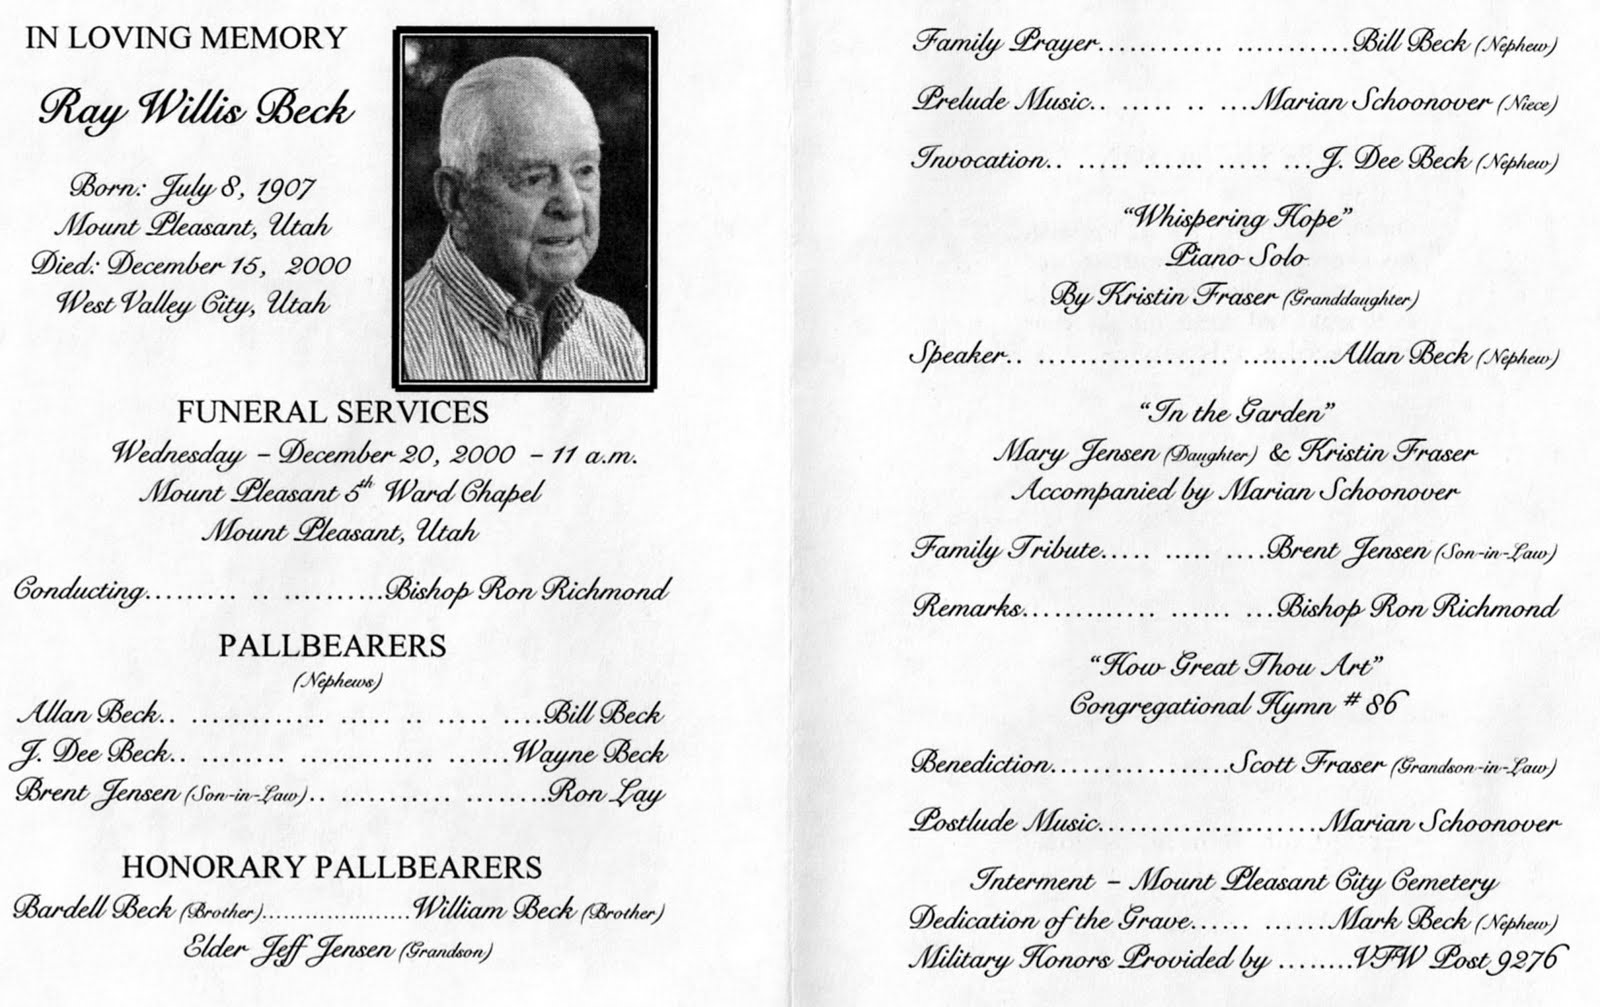 Obituary Program Template Beck%2C%2BRay%2B%2Bfuneral%2Bprogram Obituary Program  Template Free Obituary Program Template Free Obituary Program Template  Funeral Pamphlet Template Free